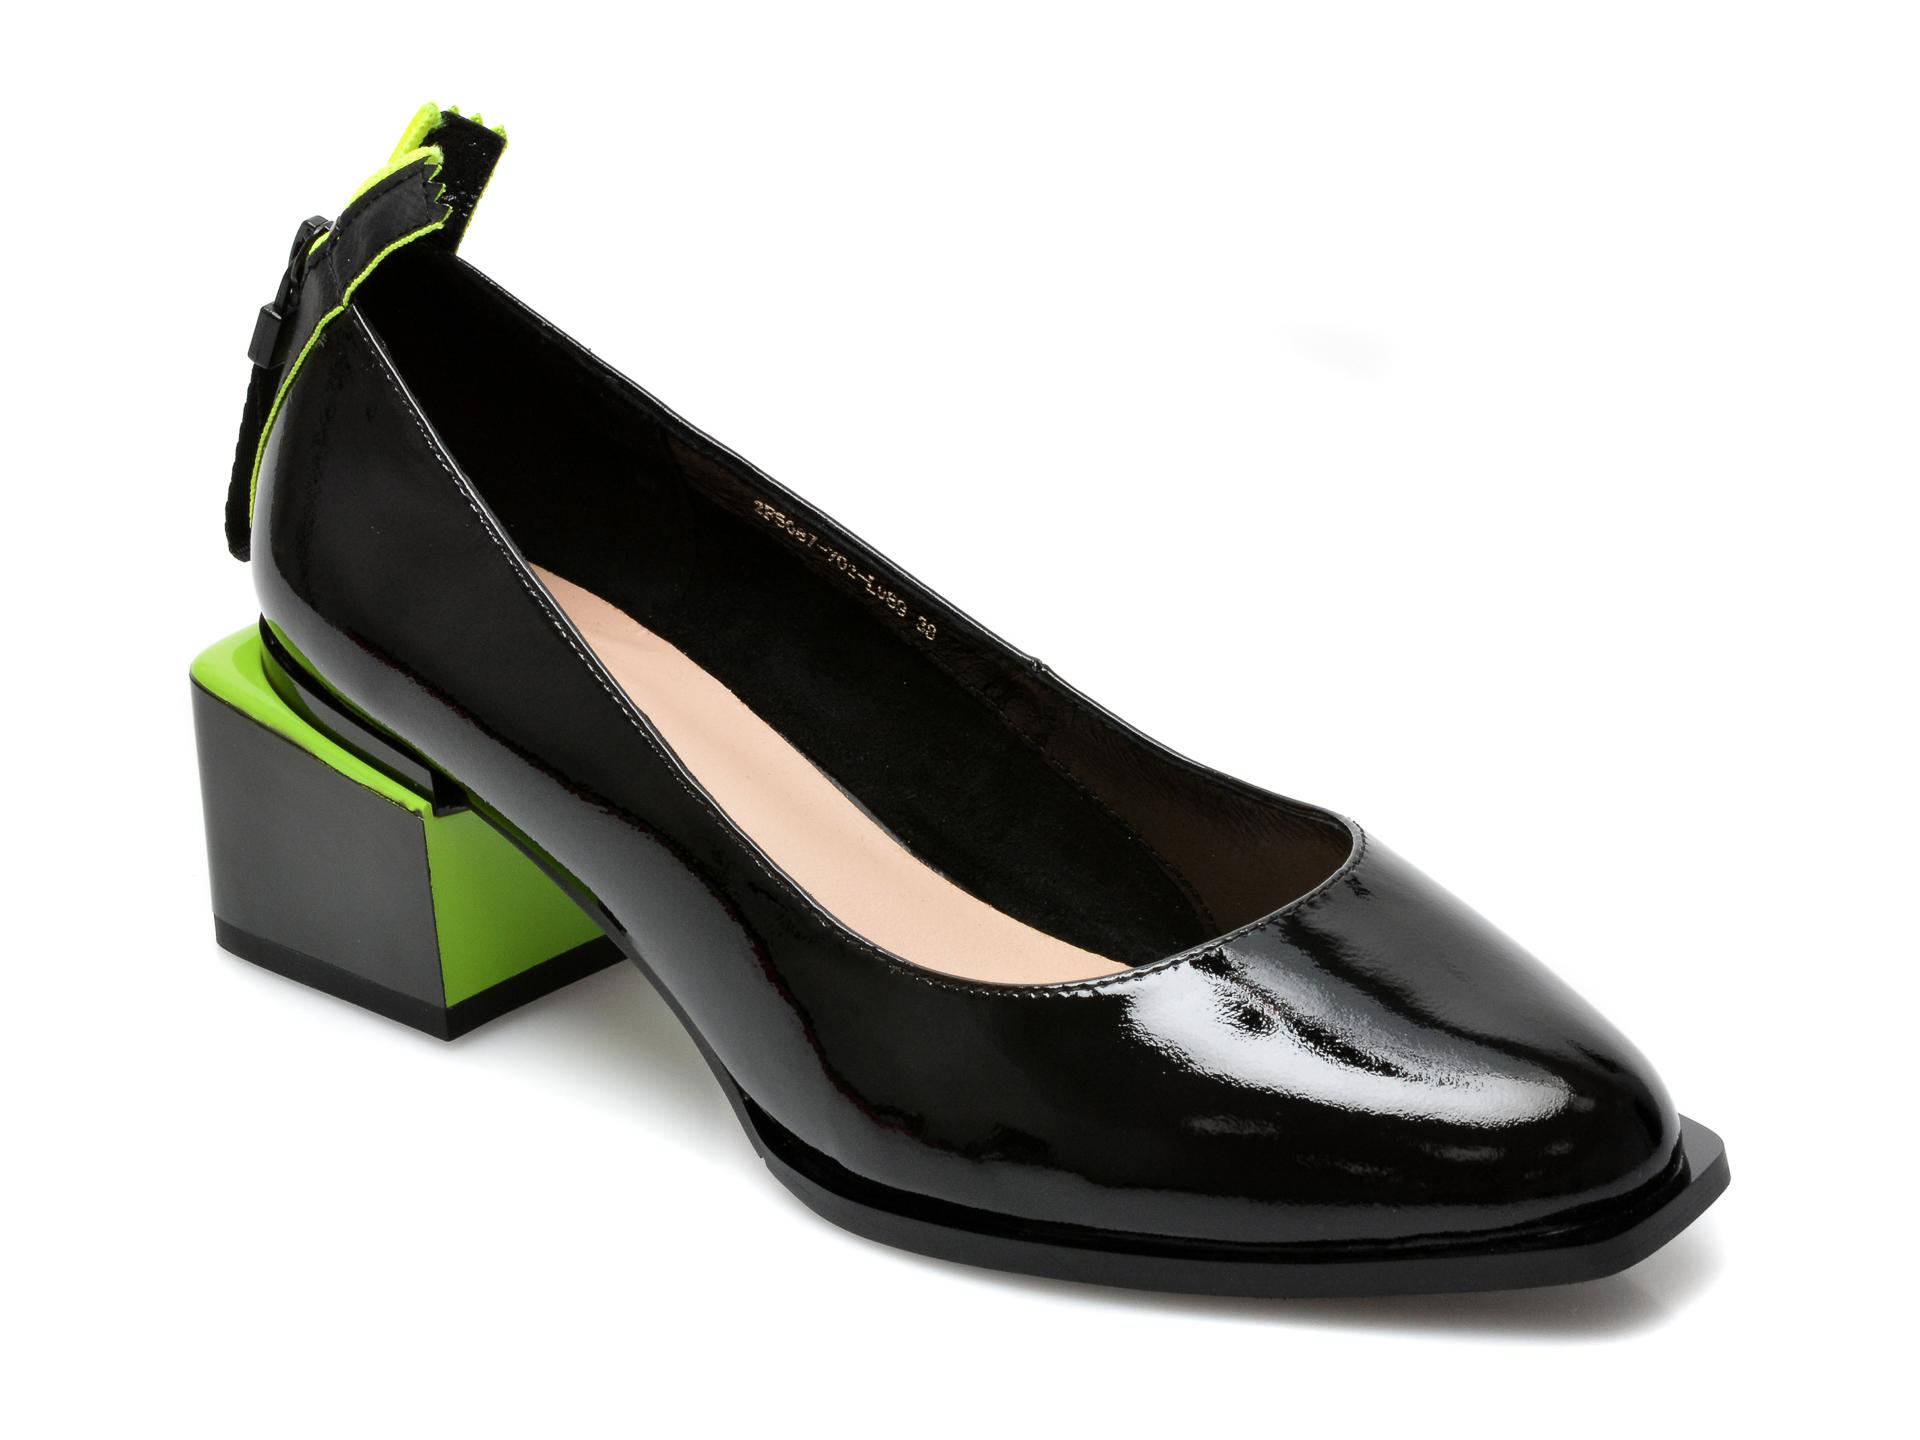 Pantofi EPICA negri, 2F50877, din piele naturala lacuita